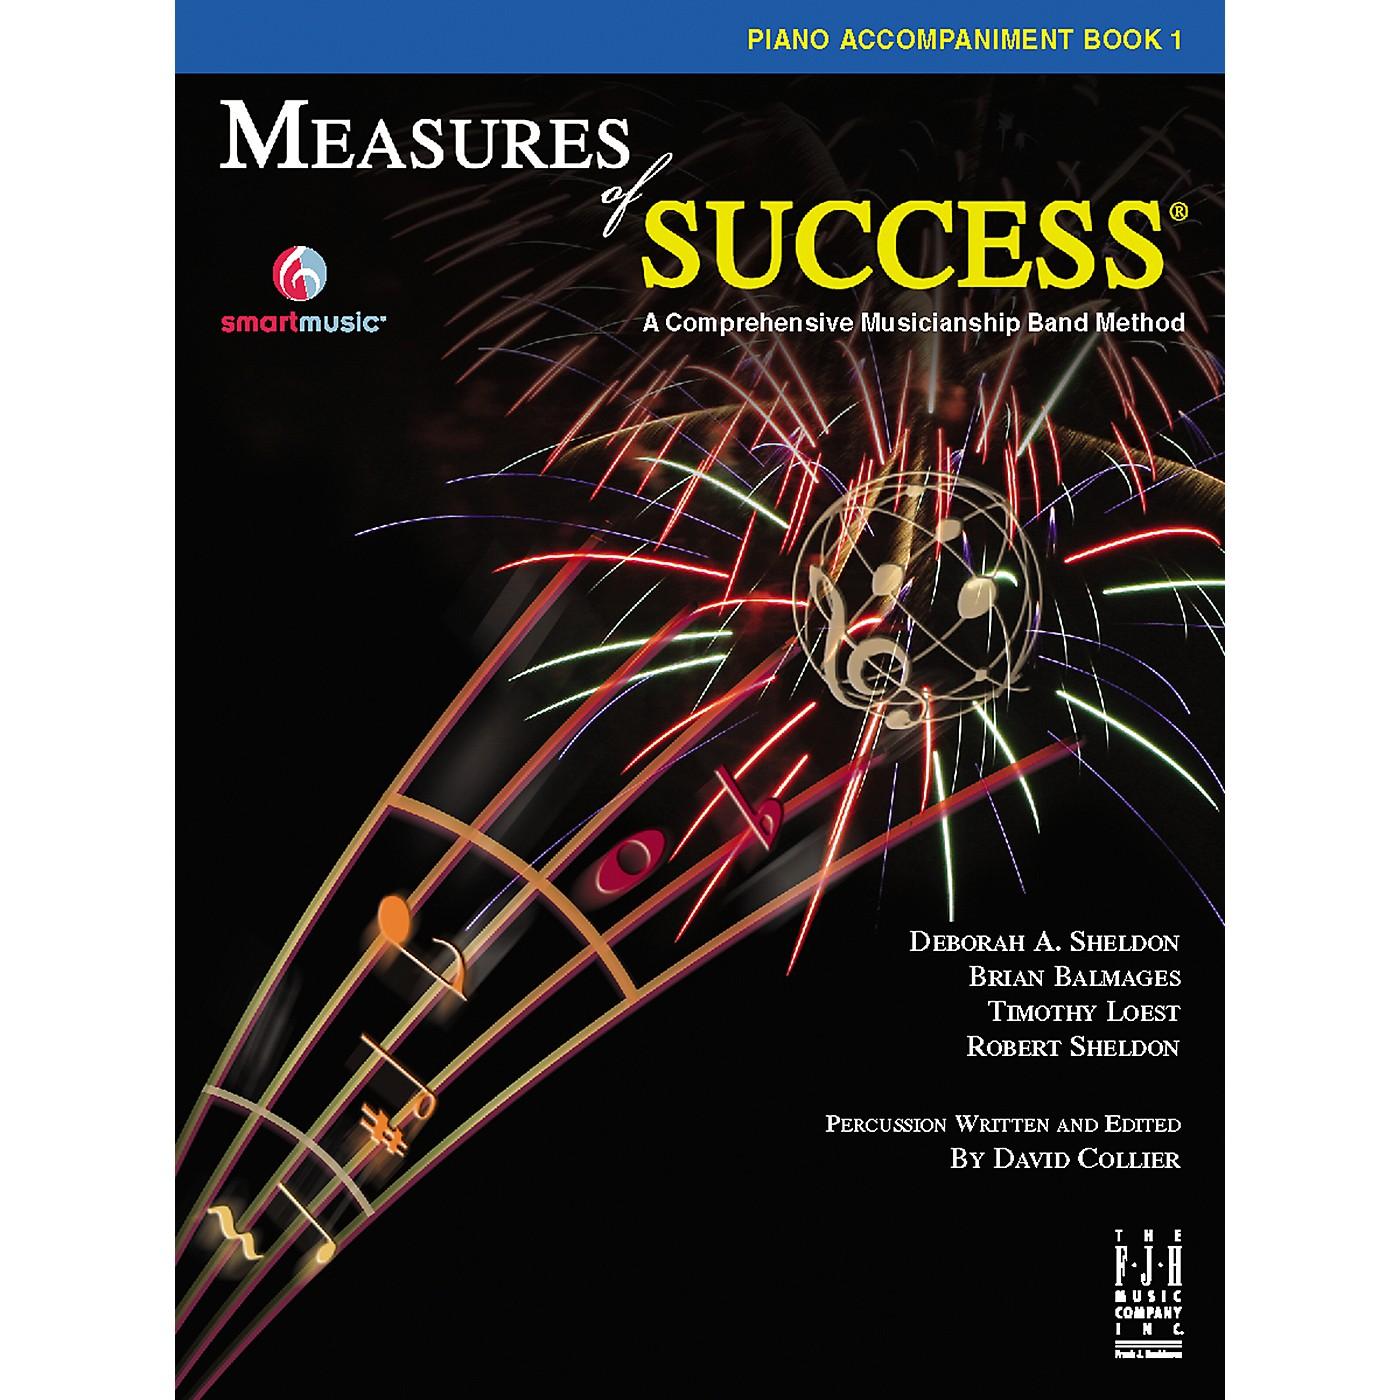 FJH Music Measures of Success® Piano Accompaniment Book 1 thumbnail